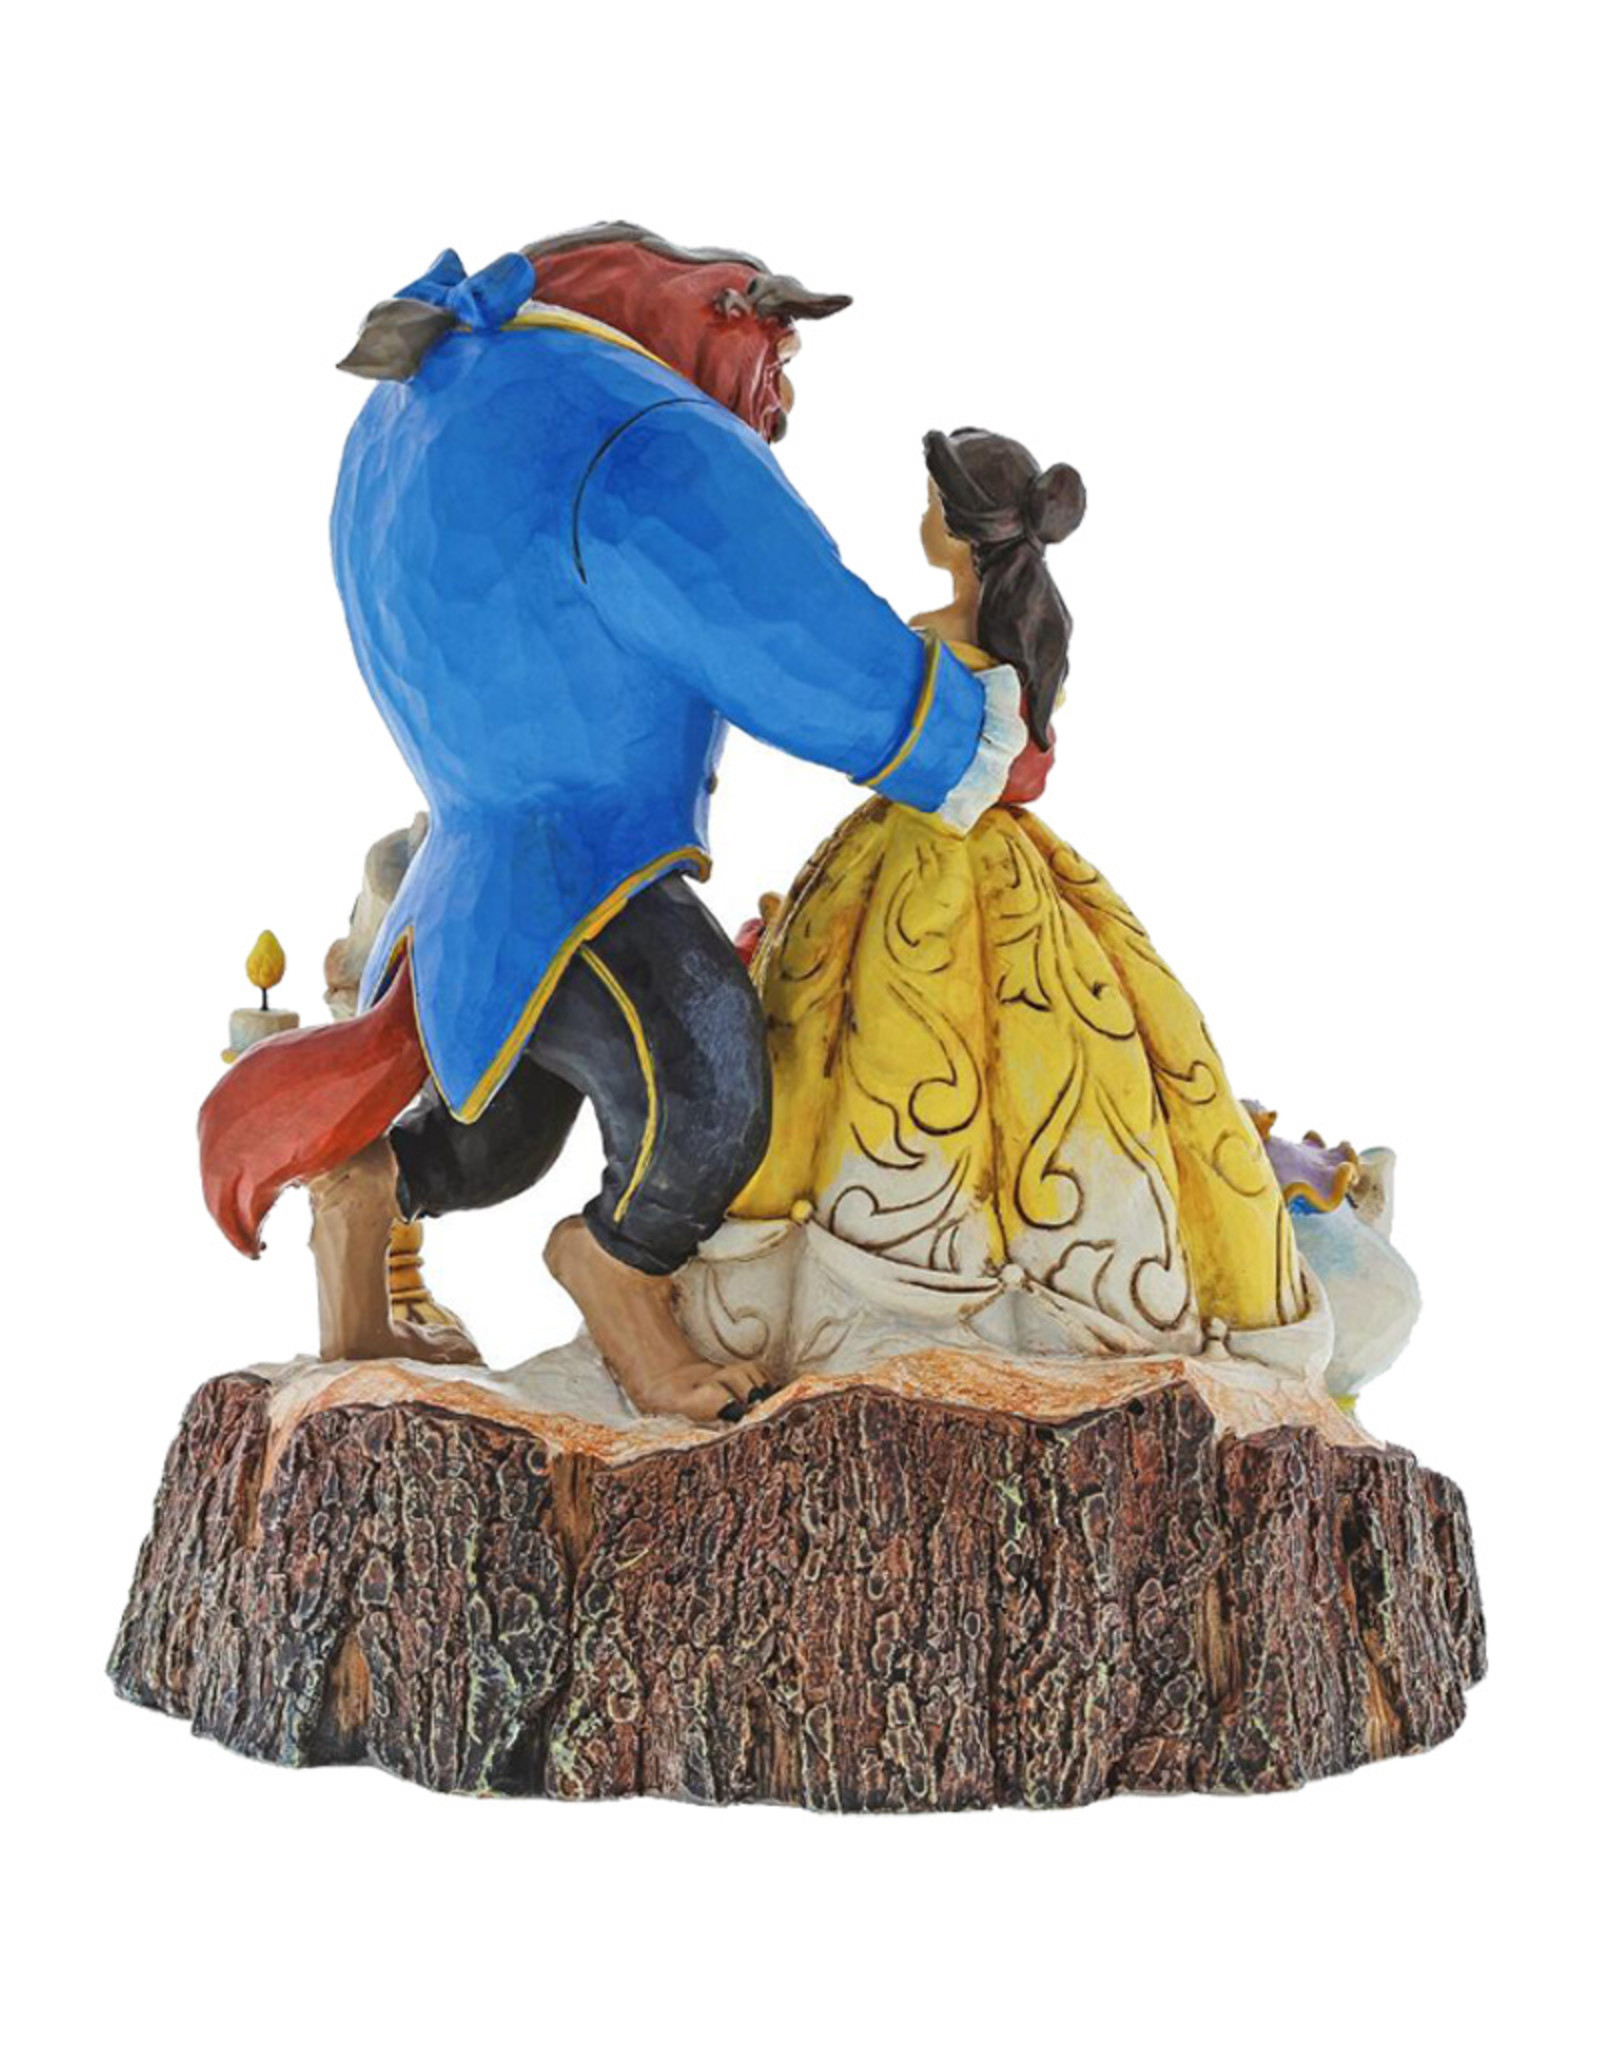 Disney Disney ( Disney Traditions Figurine ) Beauty and The Beast & Friends